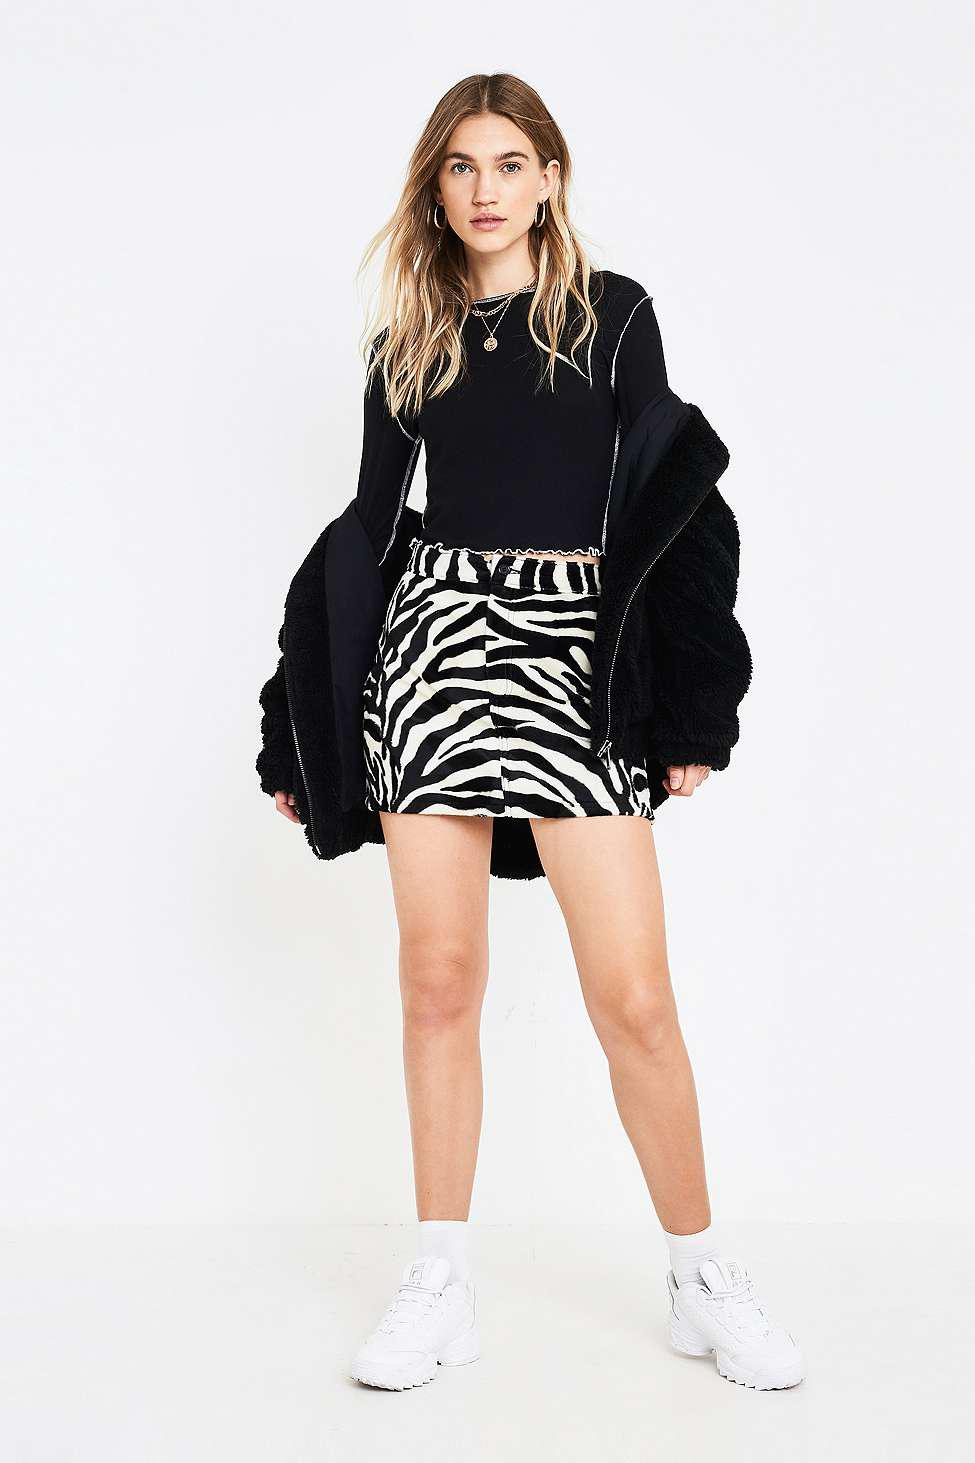 a133e8bda4b Urban Outfitters Uo Black Contrast Stitch Lettuce Edge Top - Womens ...